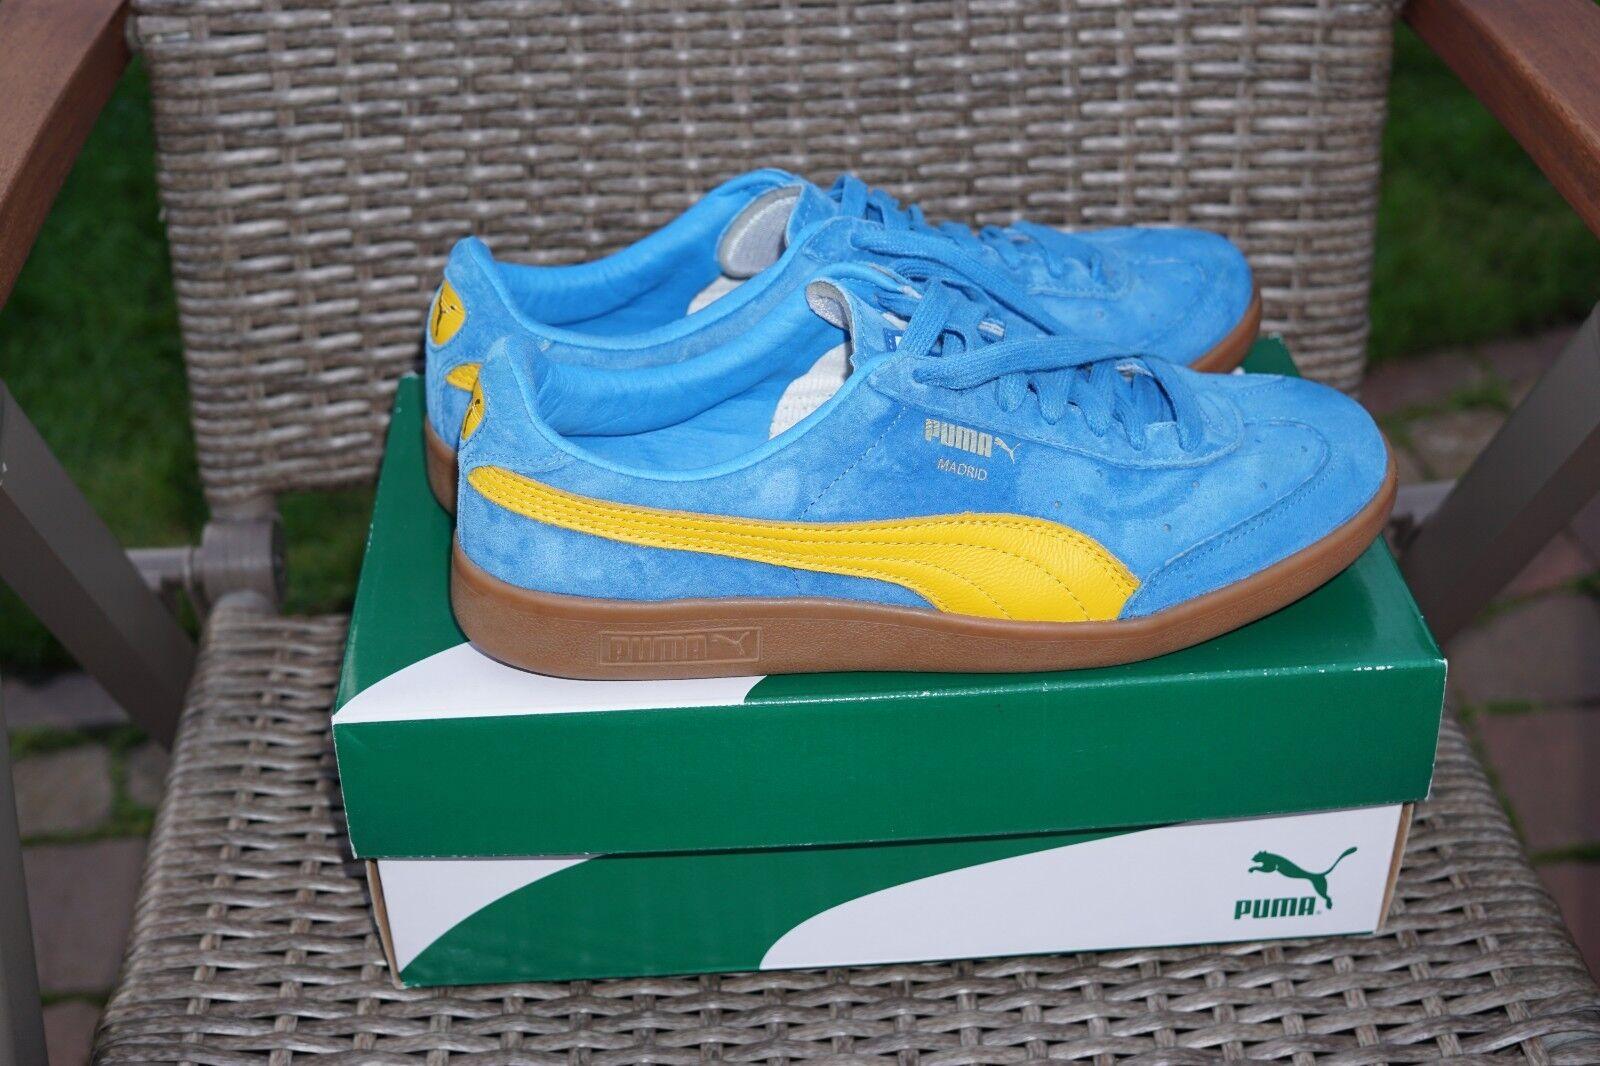 Puma - sneaker in madrid. turnschuhe blau blau blau gelb wie neu mit karton 10 988a9a